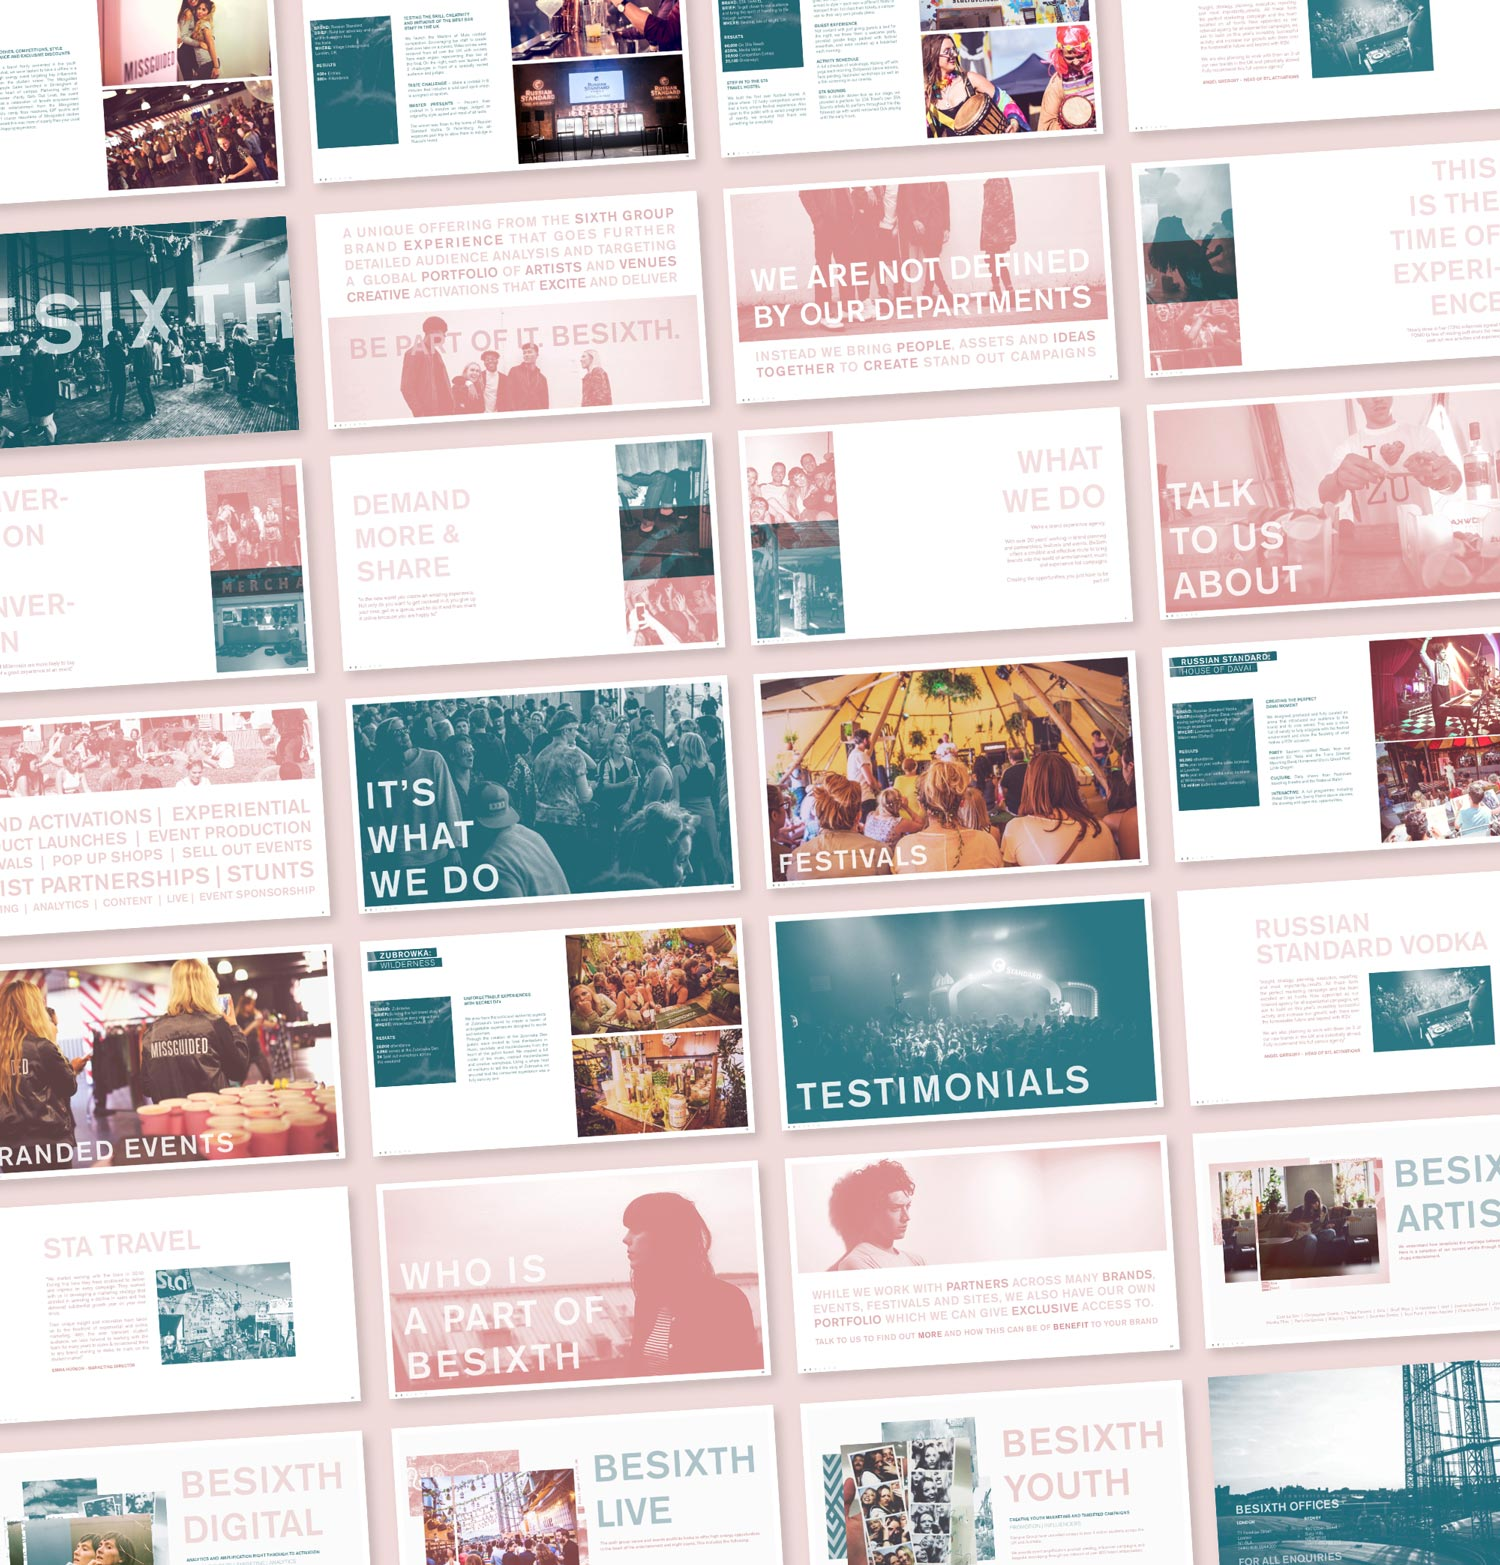 Besixth presentation slides. Company credentials on pink background.